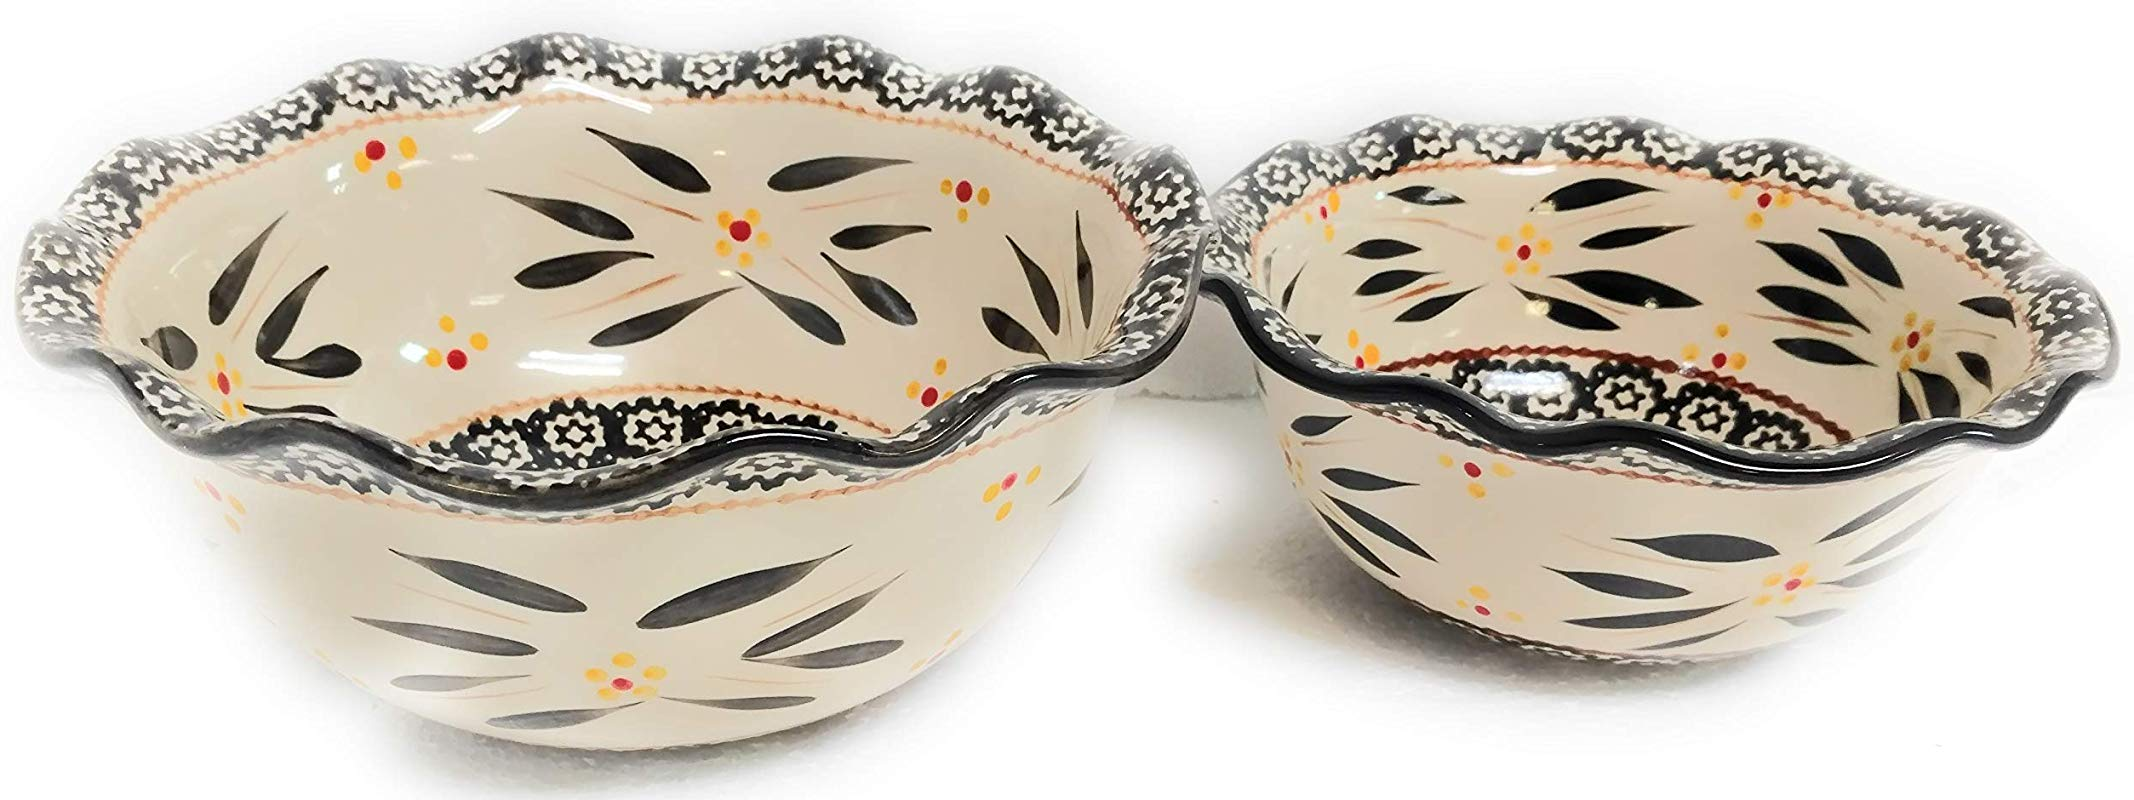 Temp Tations Set Of 2 Bowls Ruffle Edge Mix Bake Serve 2 0 Qt 1 0 Qt Old World Black